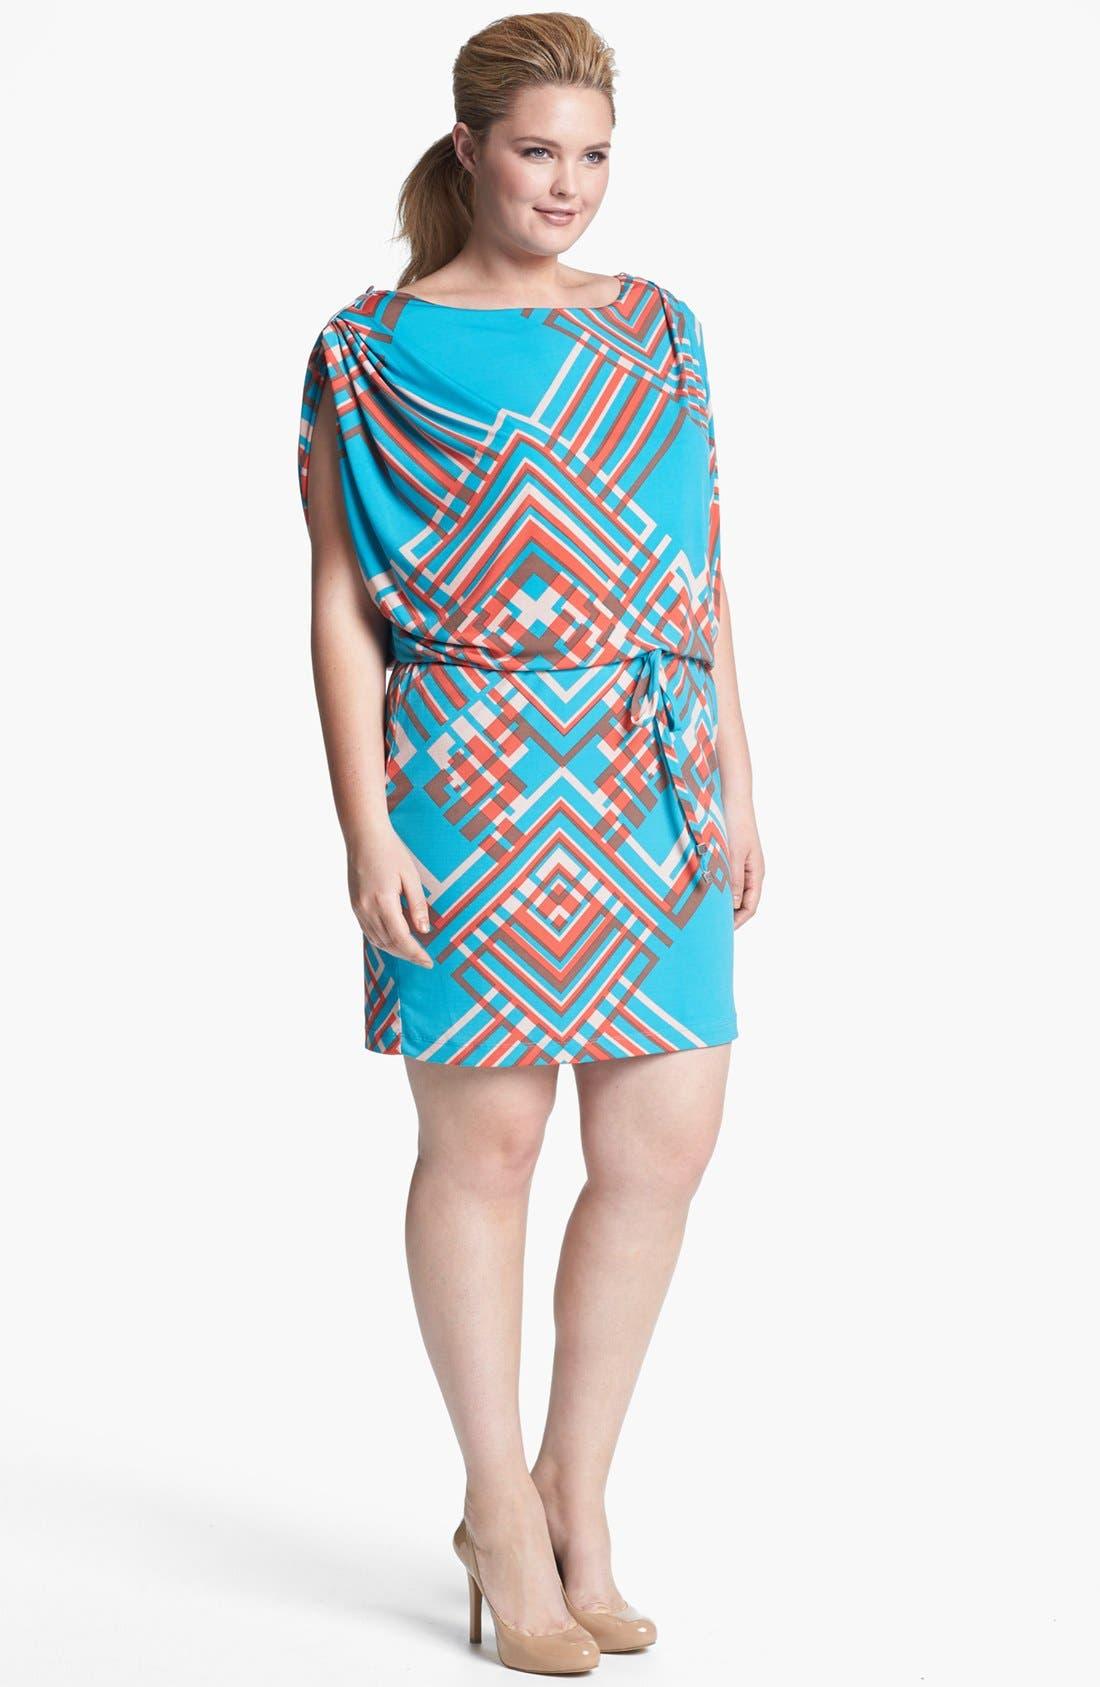 Alternate Image 1 Selected - Jessica Simpson Print Jersey Blouson Dress (Plus Size)